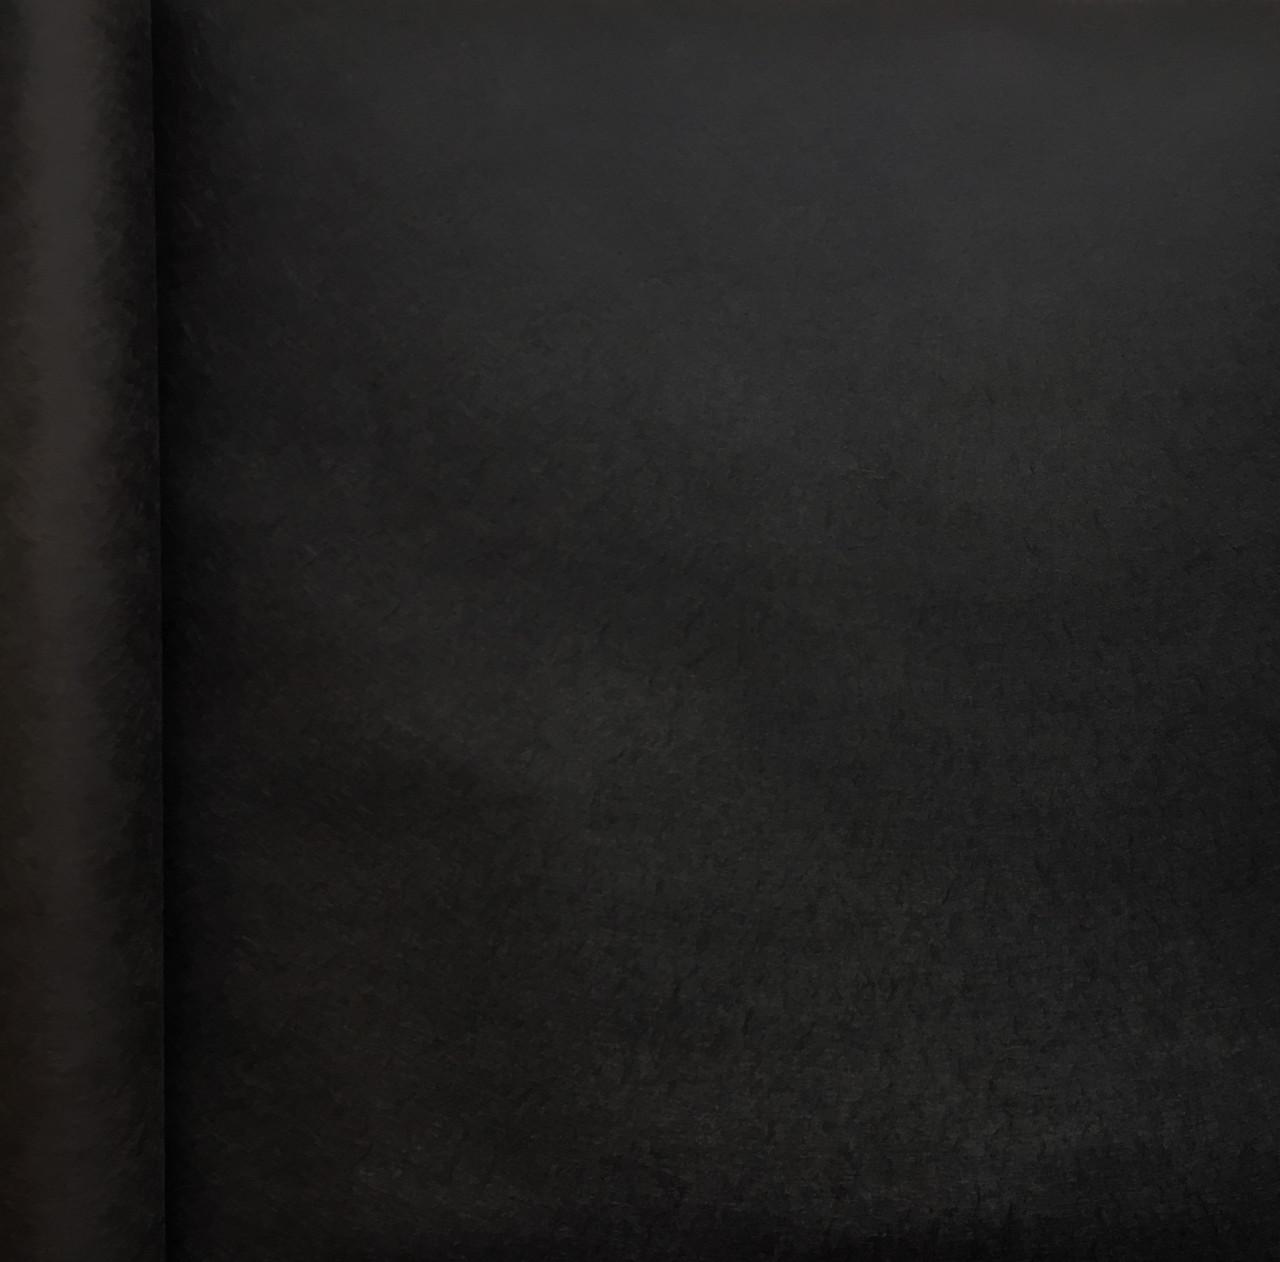 Бумага двухсторонняя черная 65 см х 9 метров